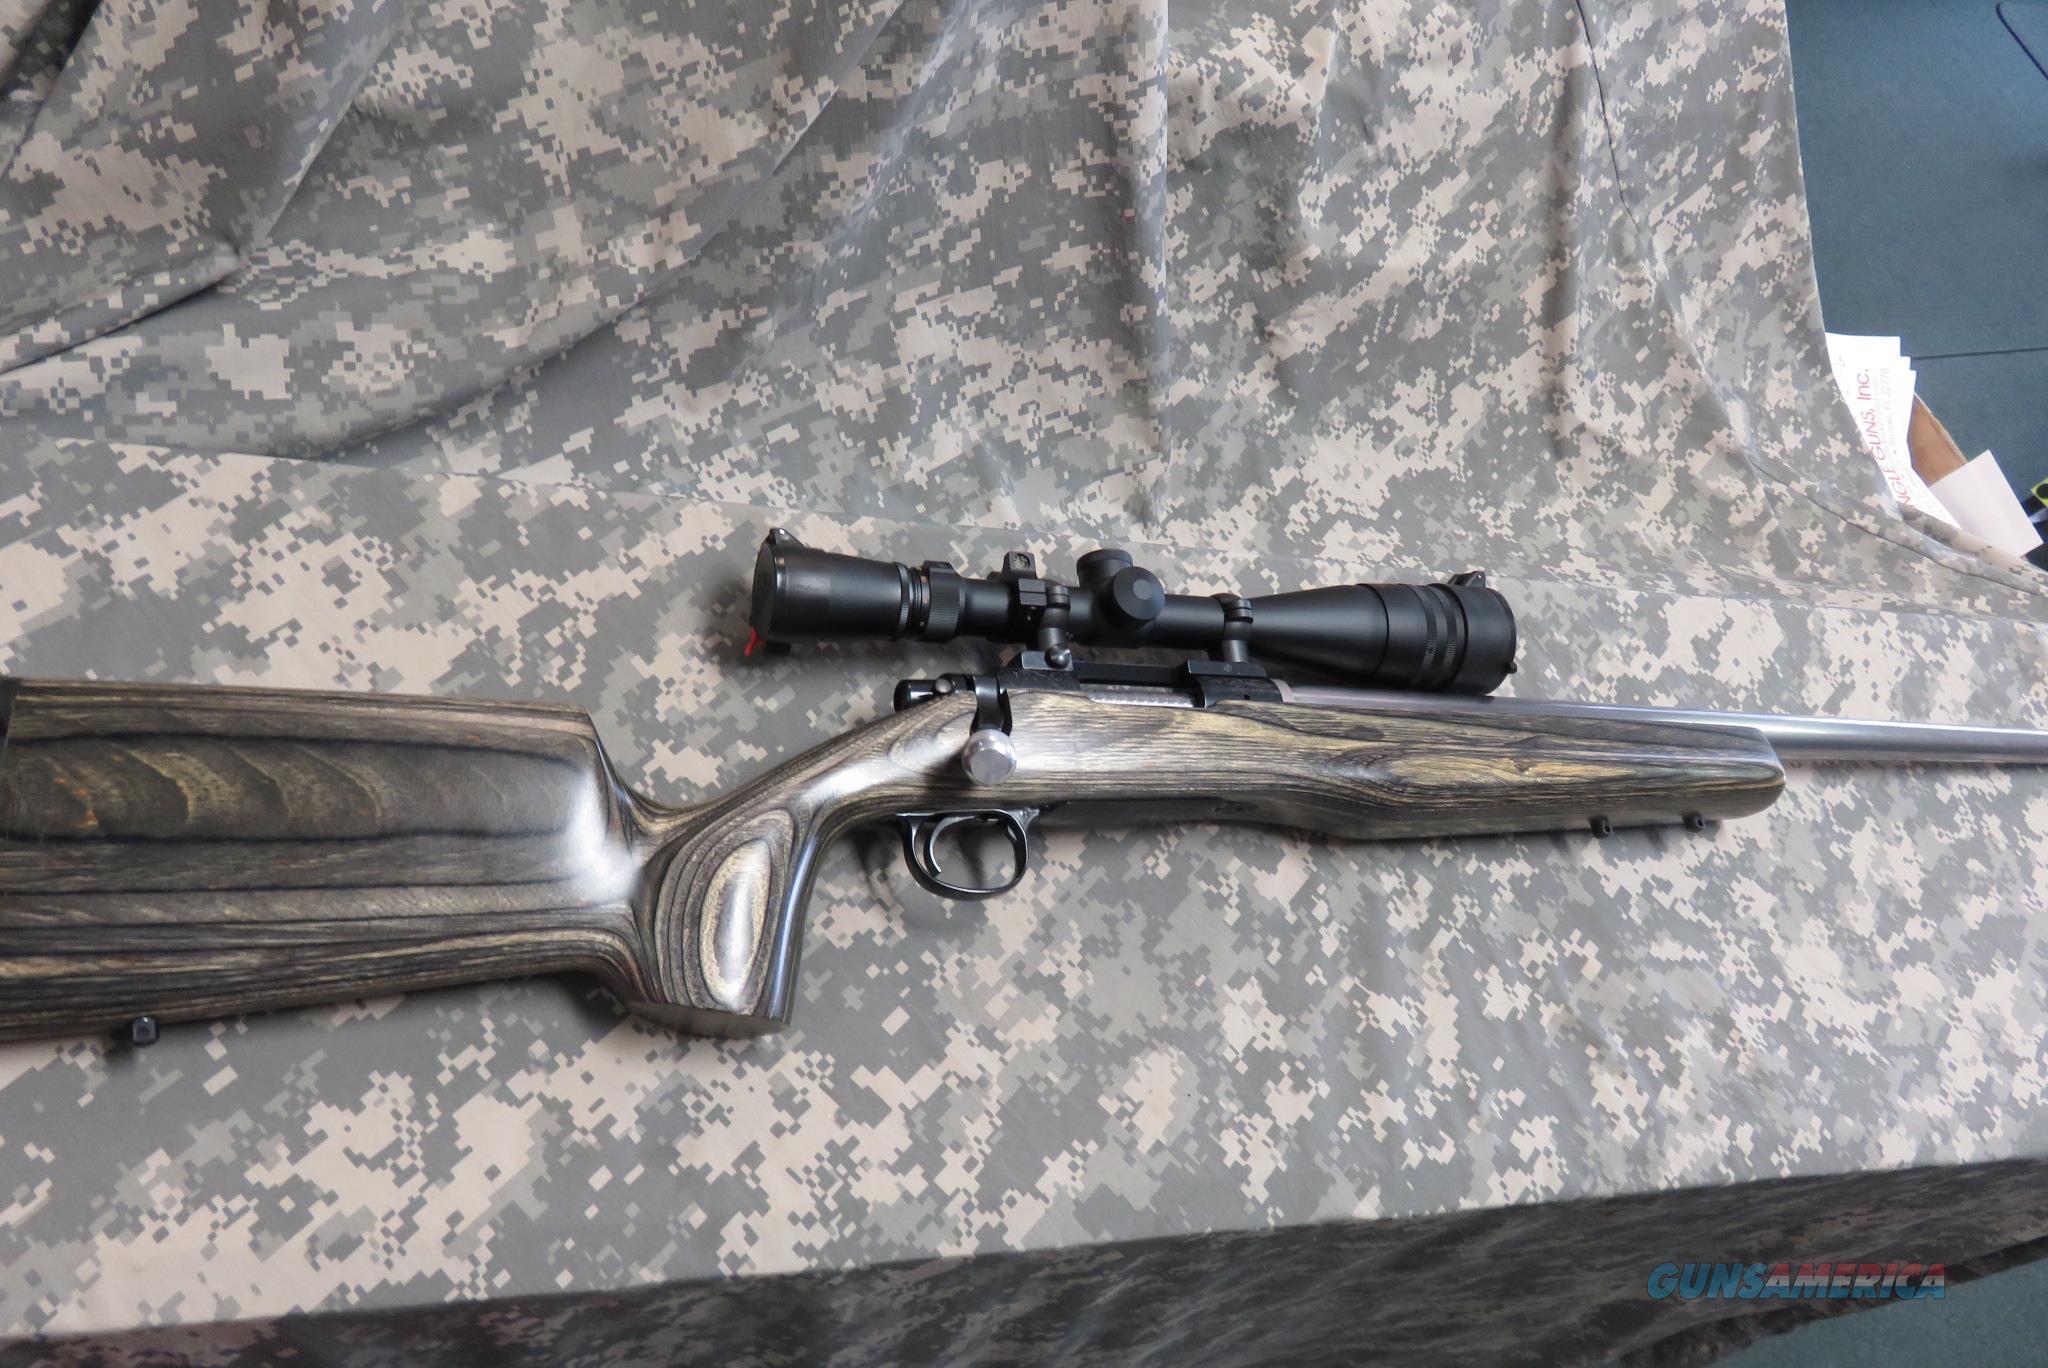 CUSTOM BUILT 6.8MM REM 700 ACTION/AB DOW BARREL**SALE**  Guns > Rifles > Custom Rifles > Bolt Action